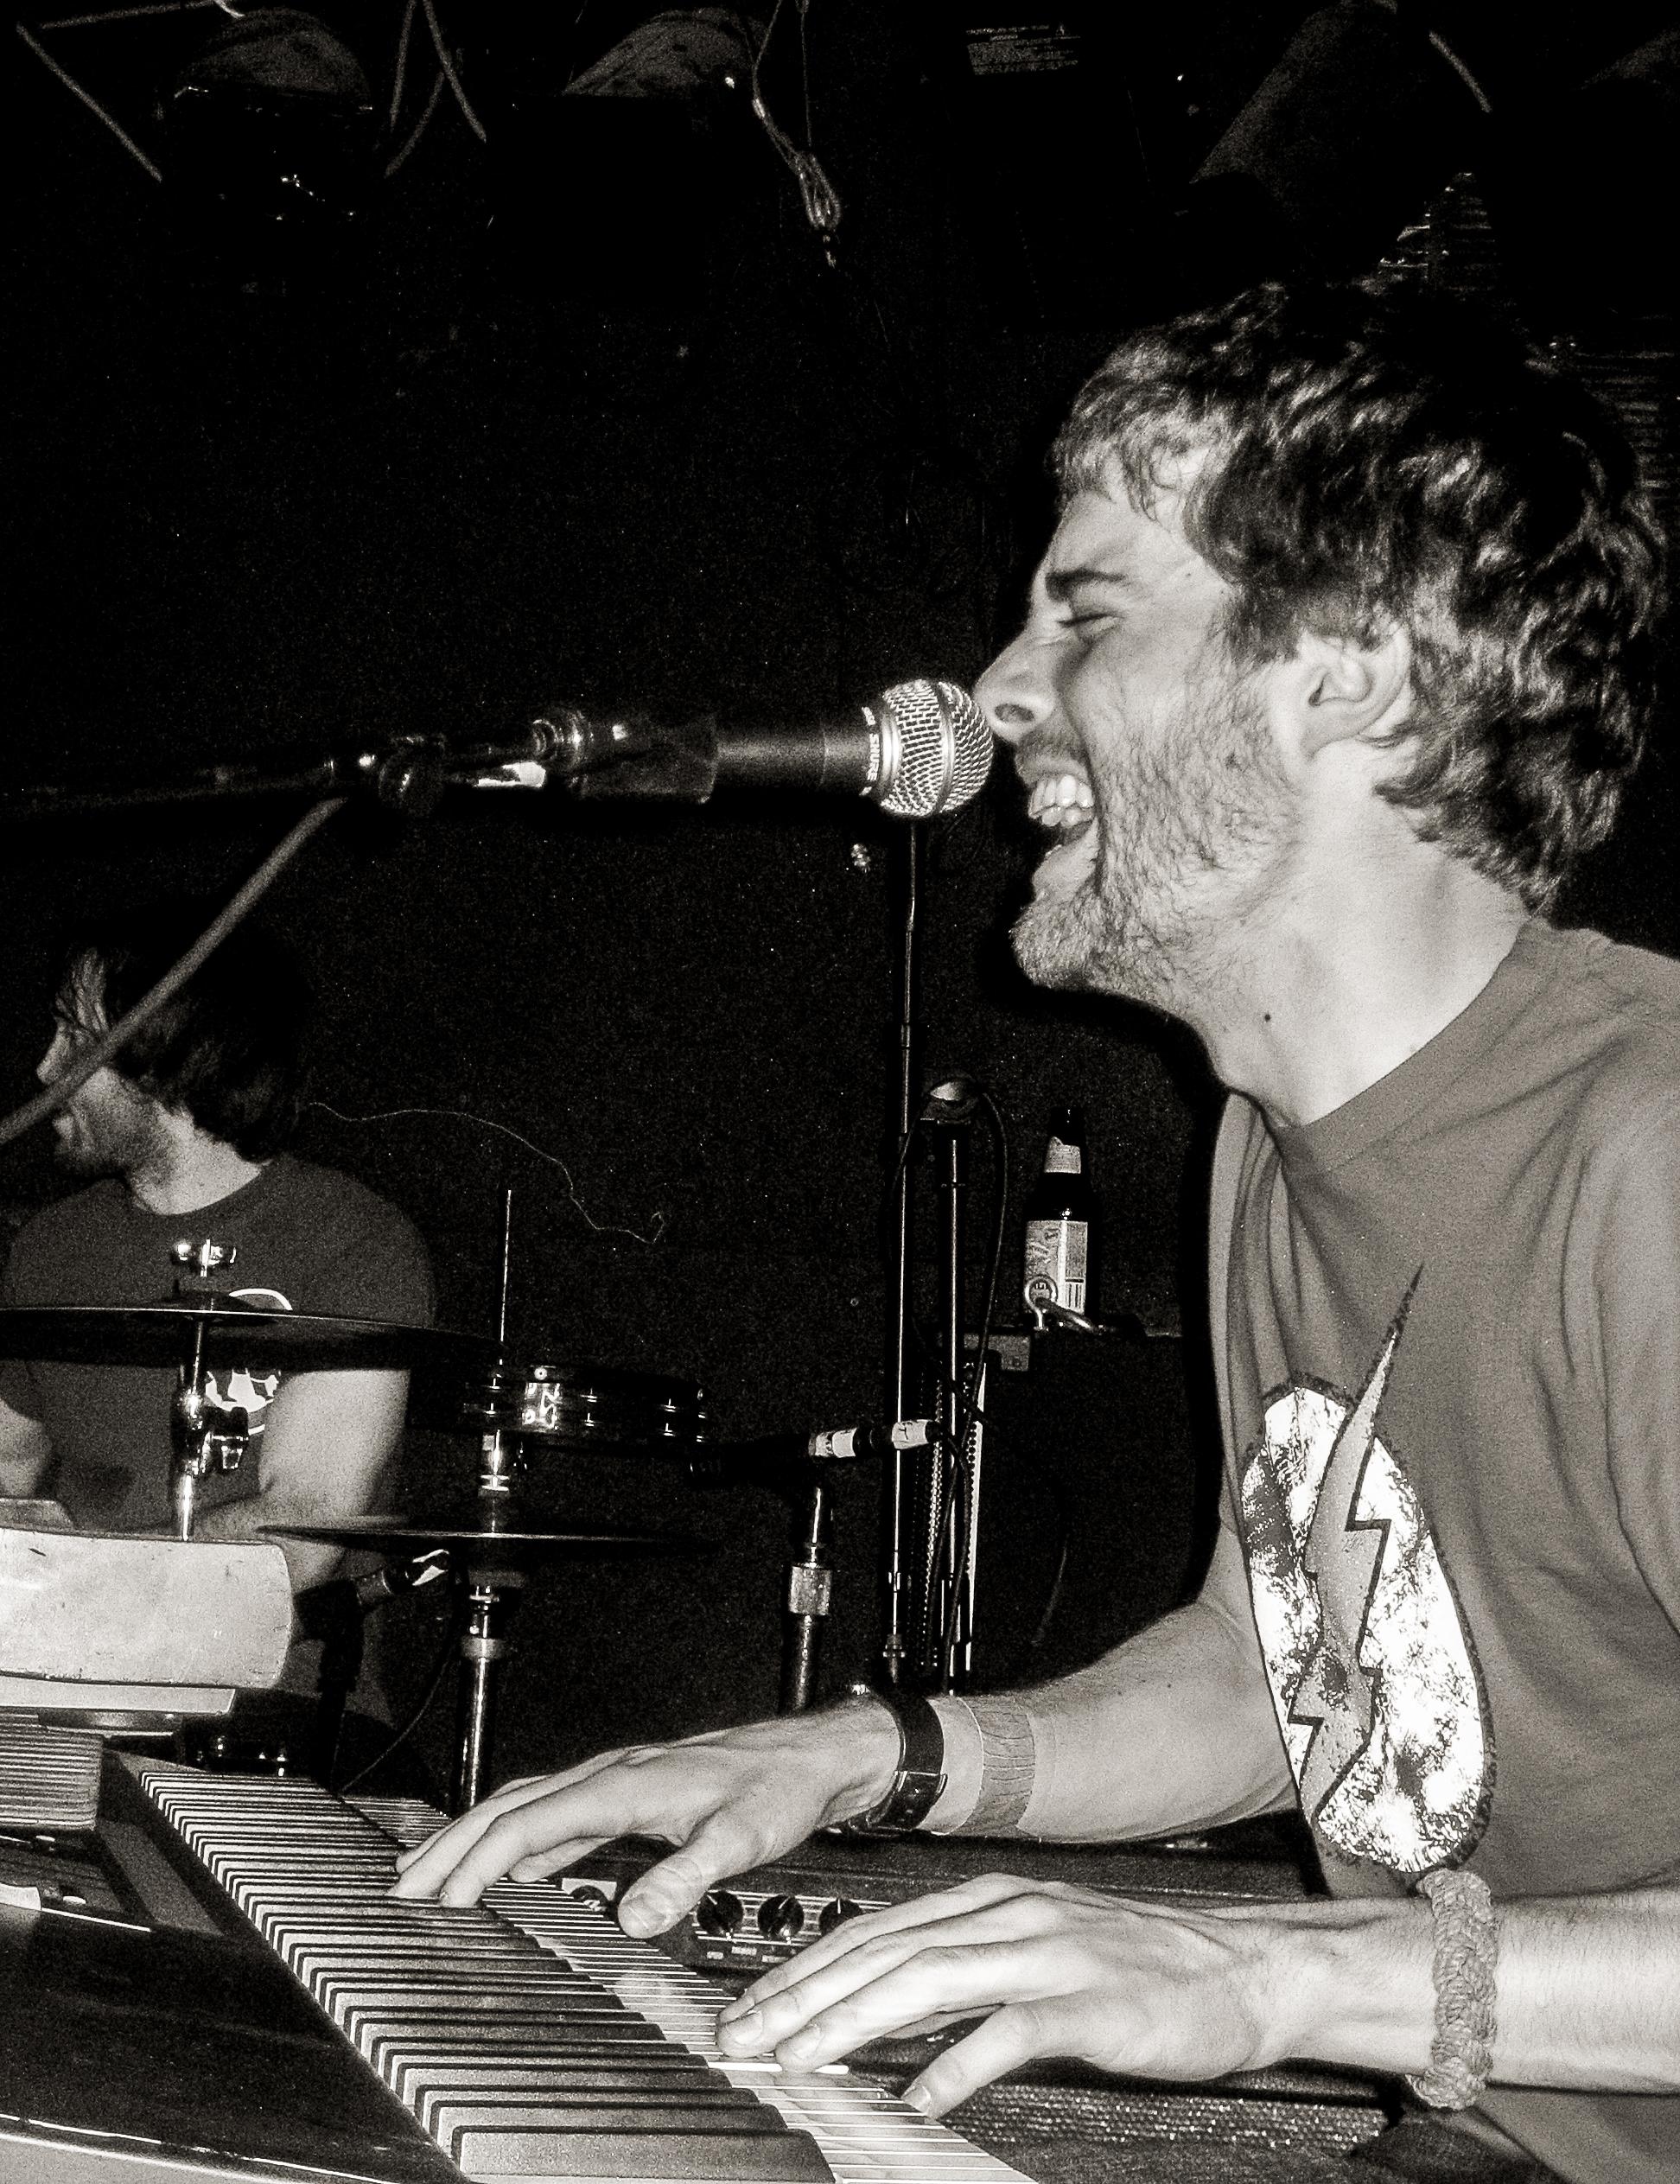 Concert Photo, Washington D.C., October 2007